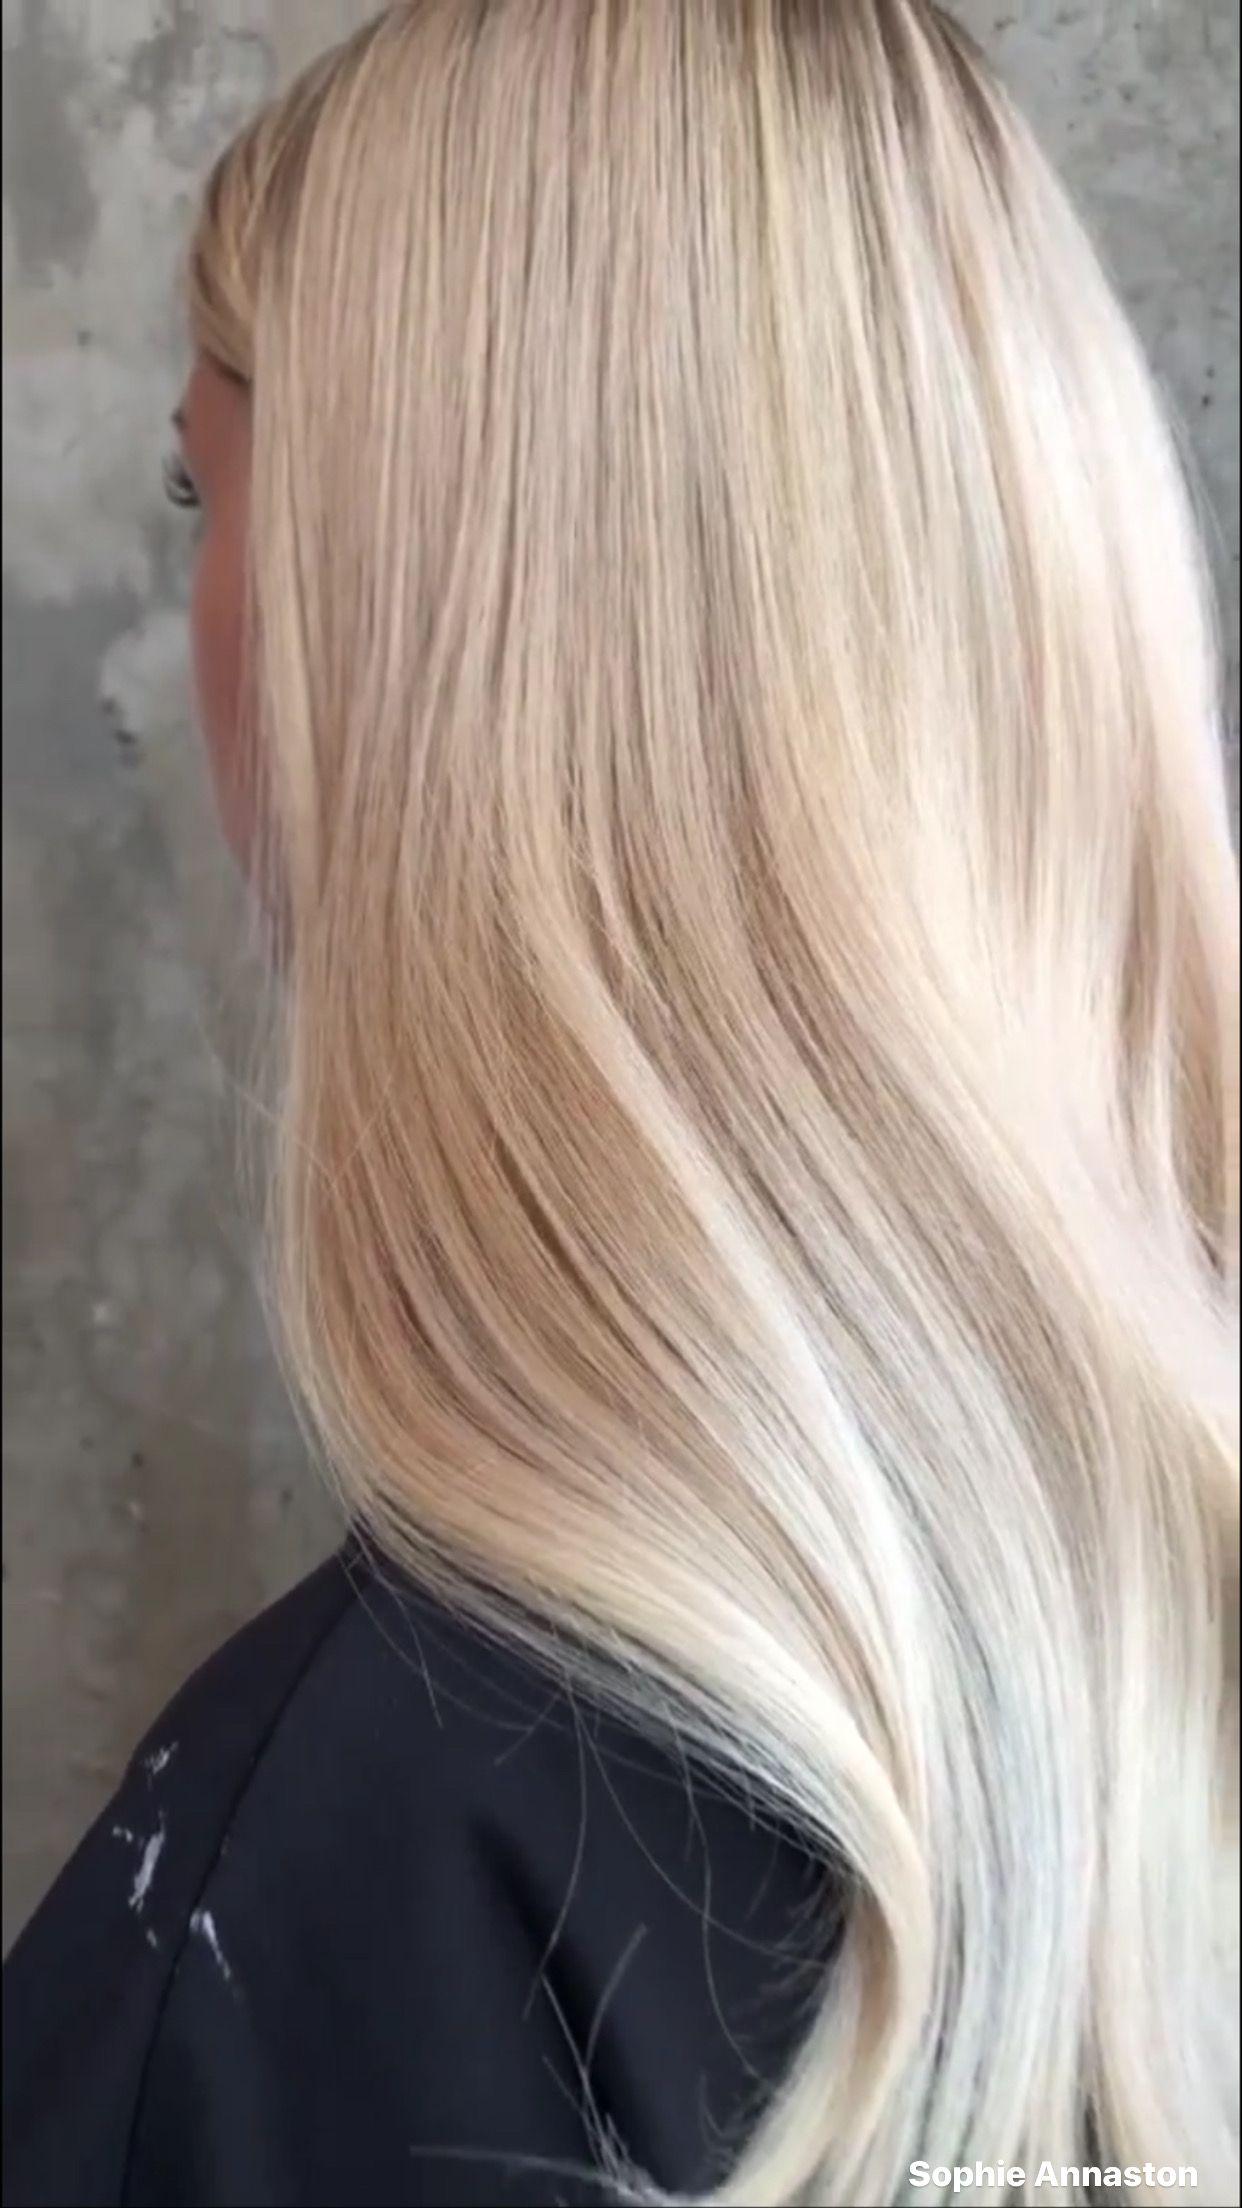 Light blonde — Blonde Hair Care